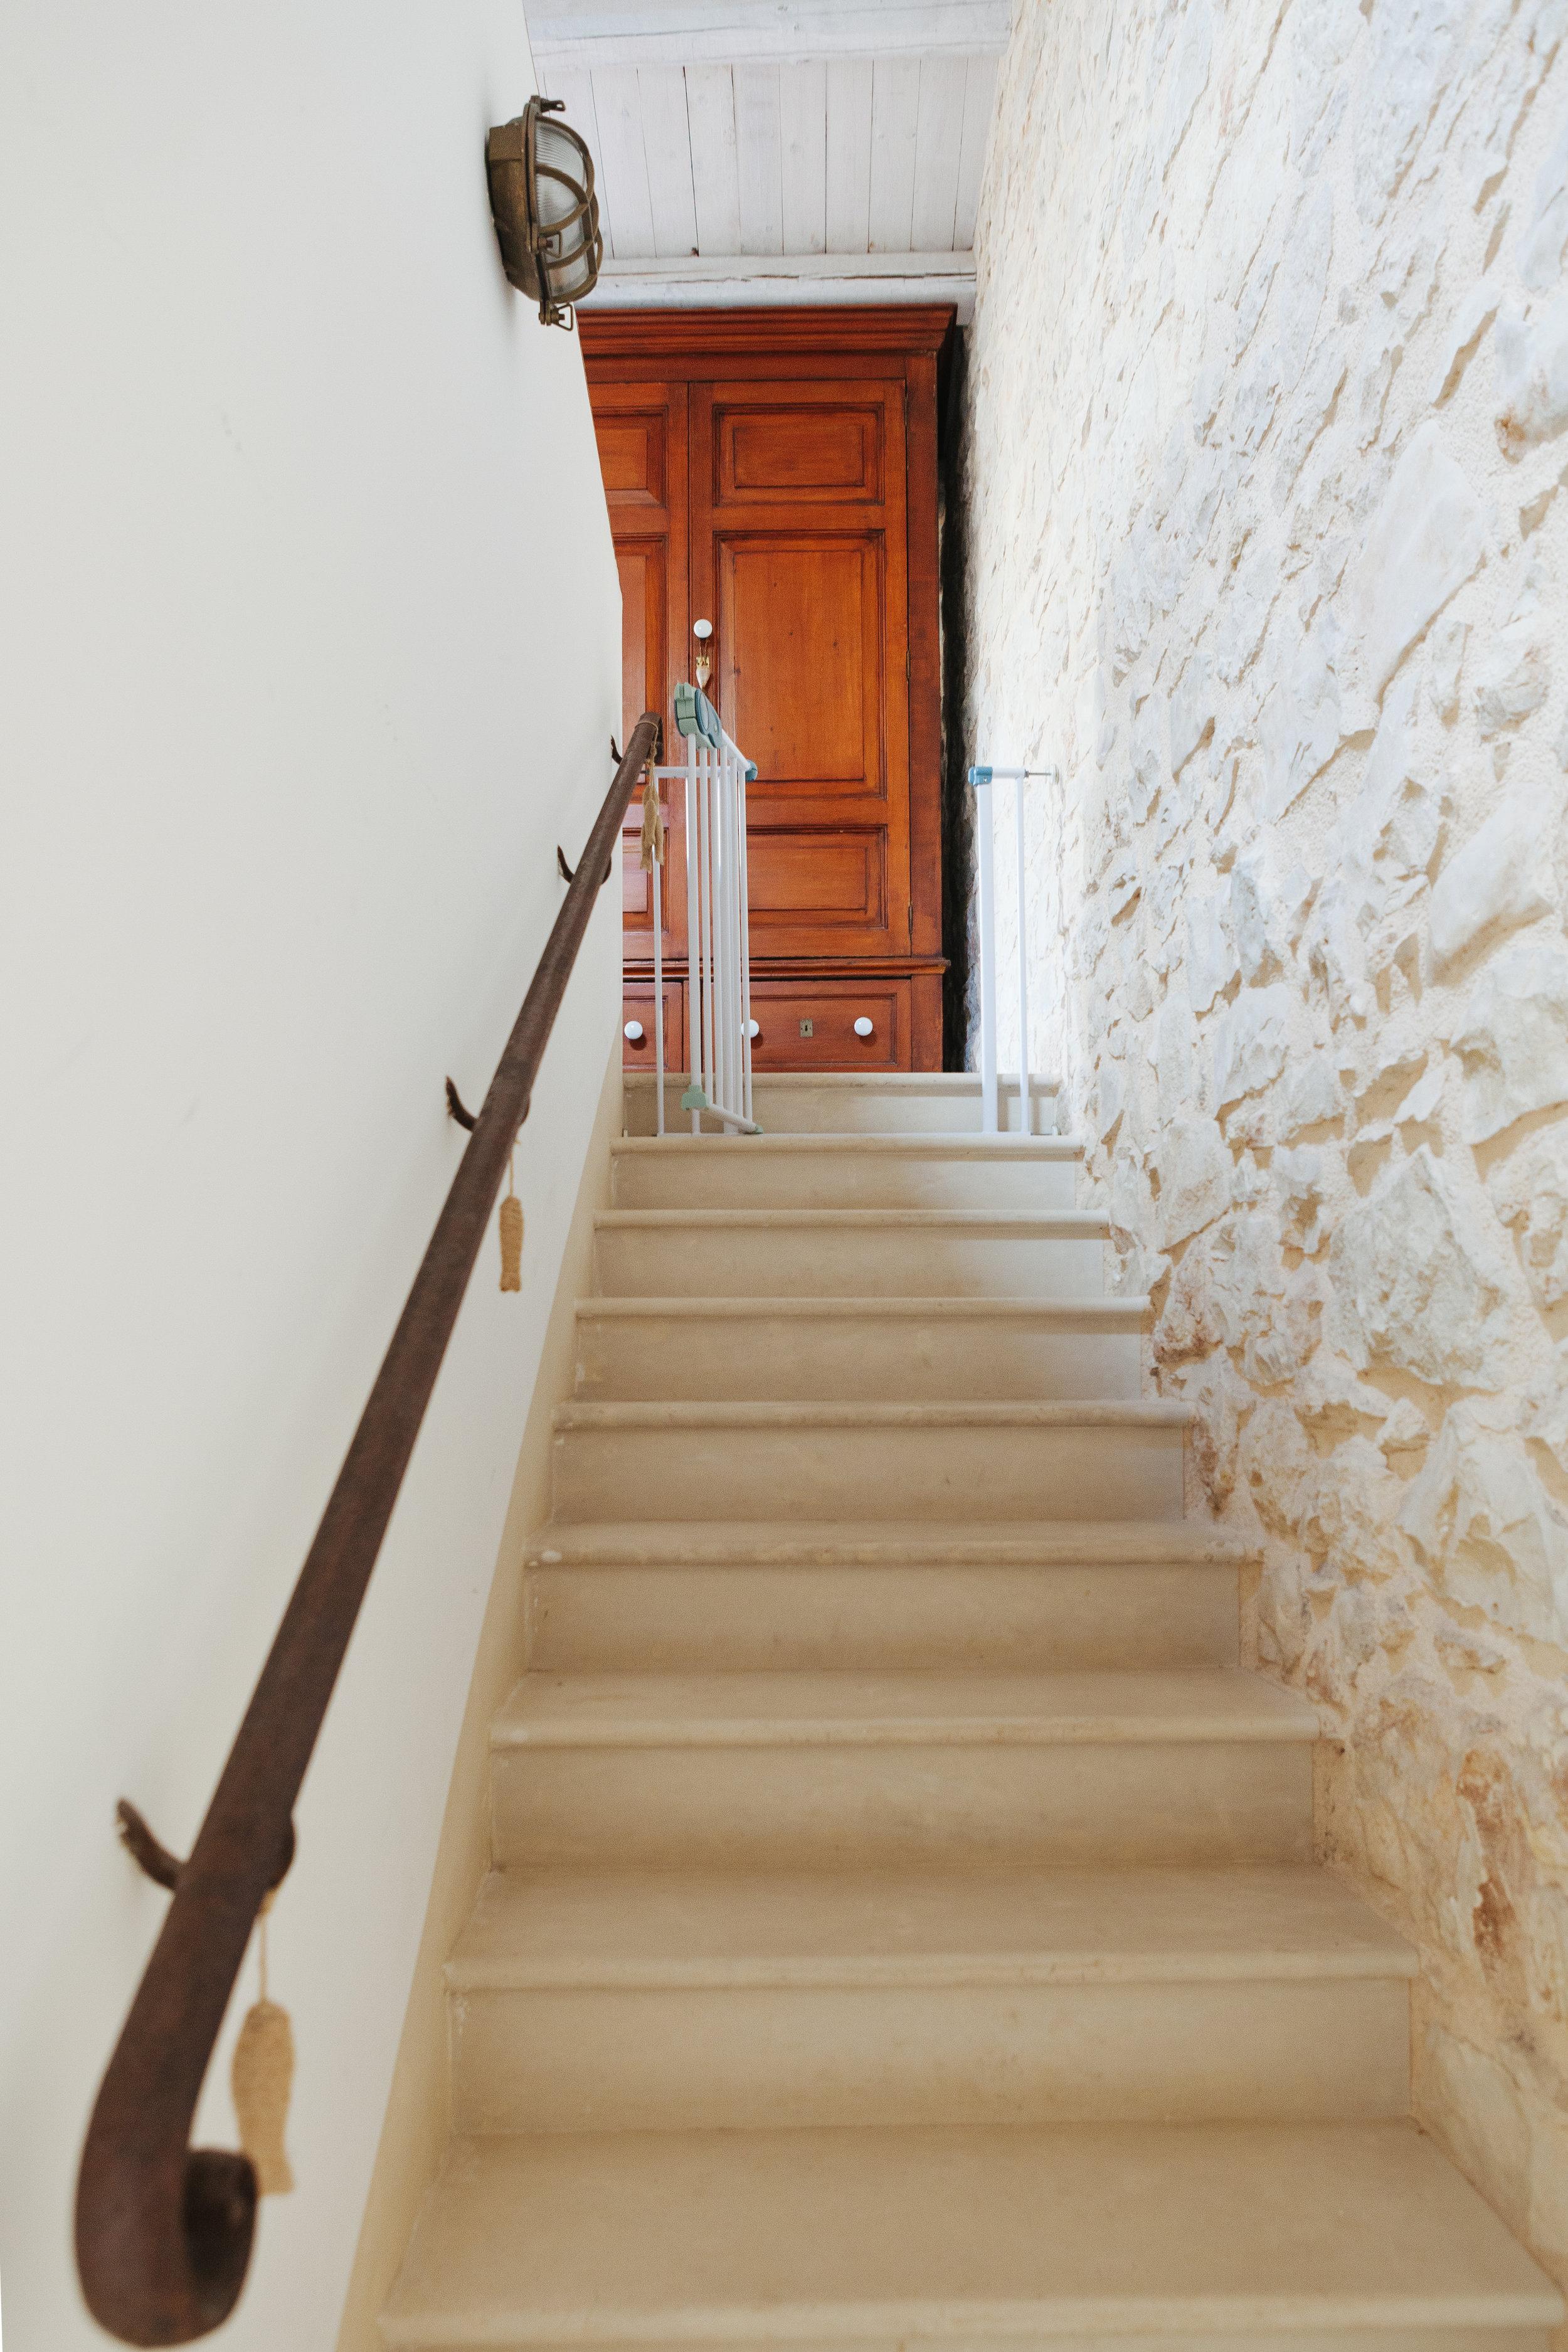 4sampieri-casa-vacanze-sicilia-appartamento-sicily-holiday-apartment-casa-di-pietra-italia-italy.jpg